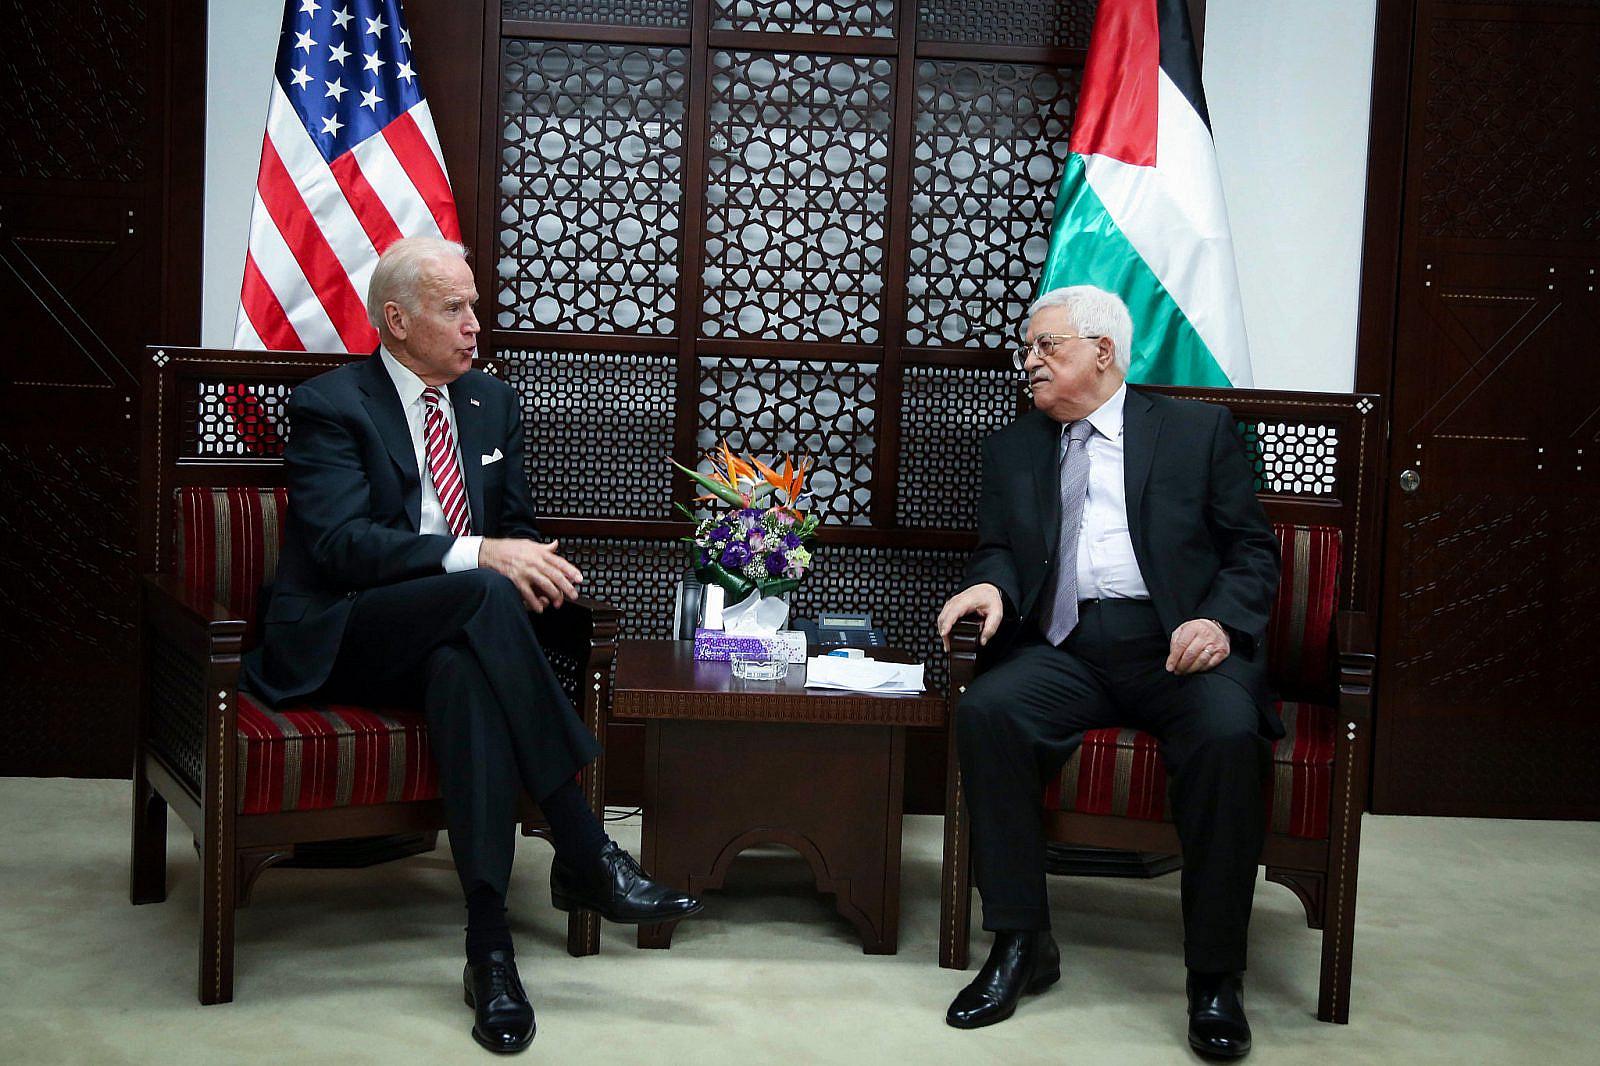 U.S. Vice President Joe Biden meets with Palestinian President Mahmoud Abbas, in the West Bank city of Ramallah, March 9, 2016. (Flash90)